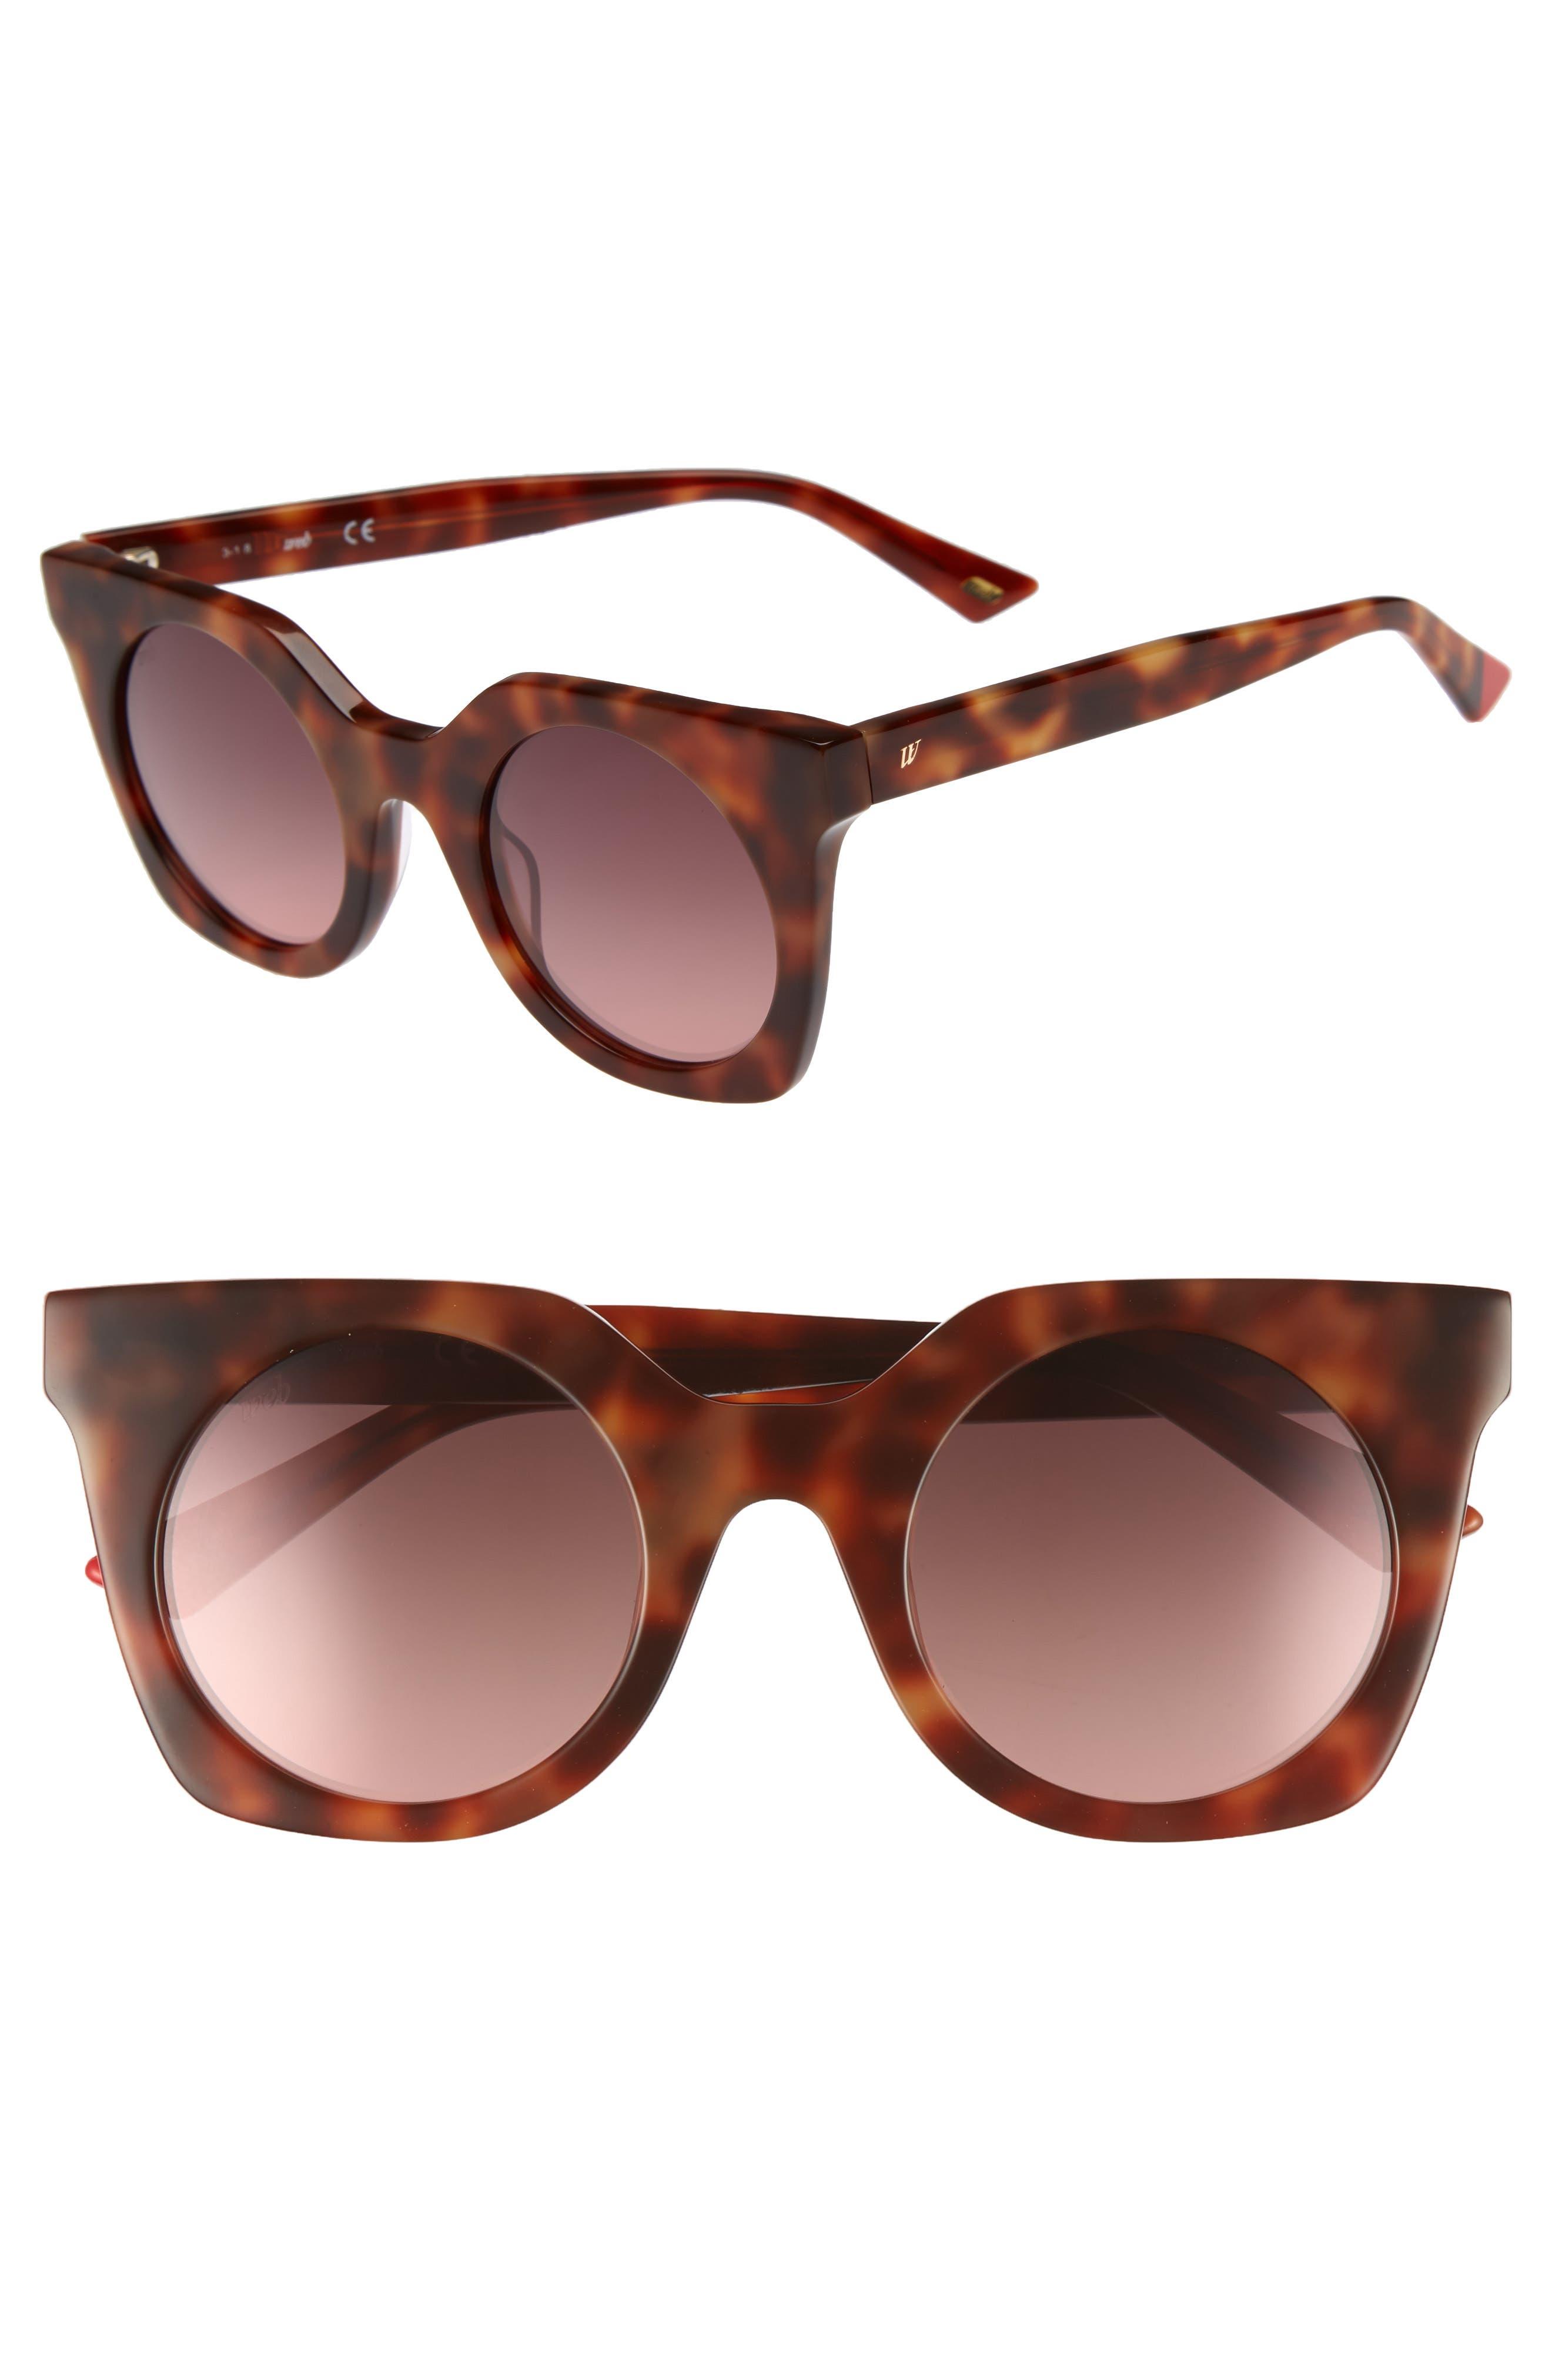 48mm Sunglasses,                             Main thumbnail 1, color,                             BLONDE HAVANA/ GRADIENT